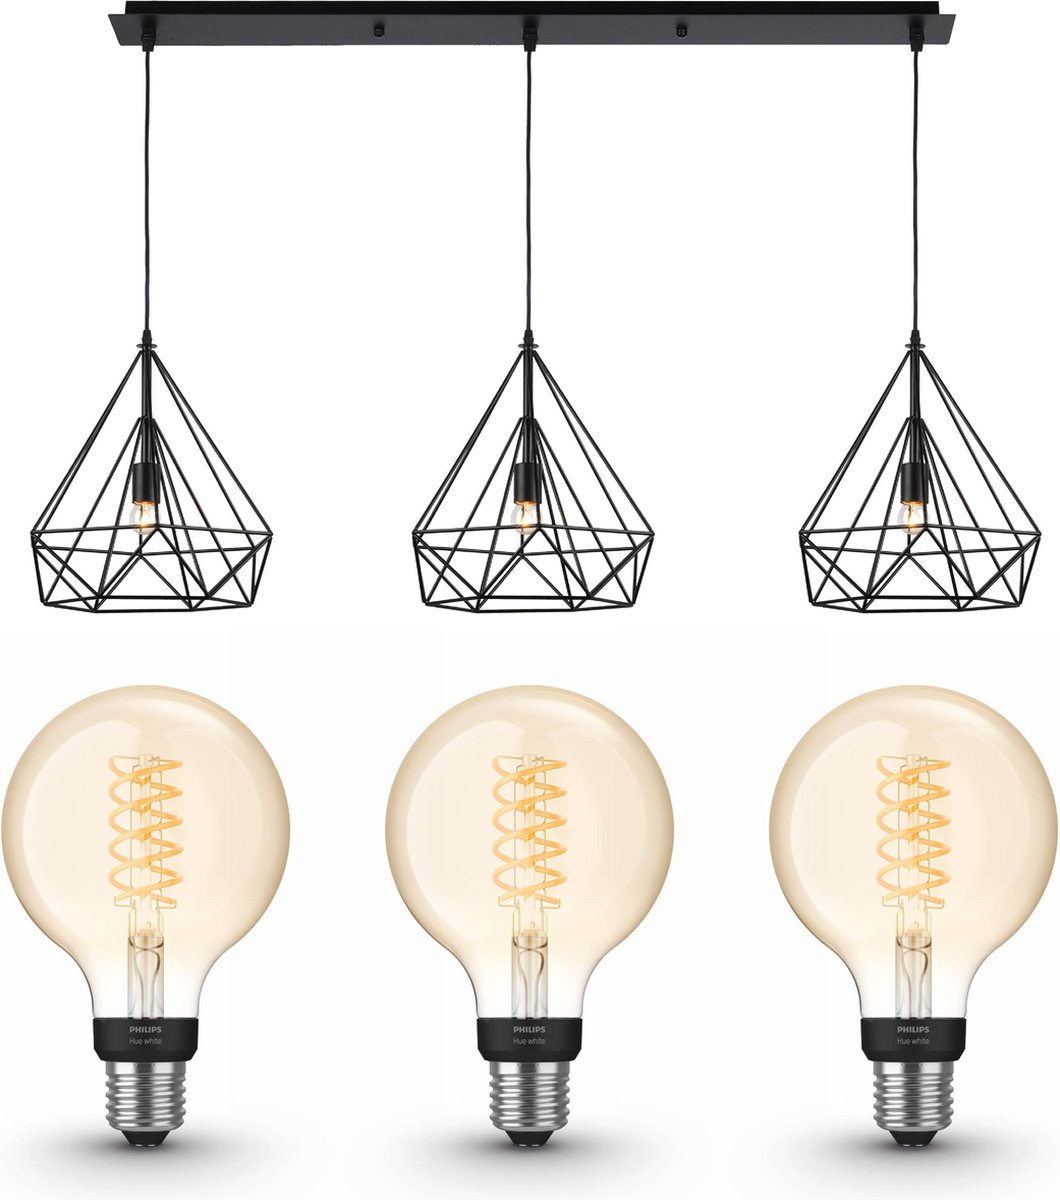 Jotaeme Arty hanglamp - LED - zwart - 3 lichtpunten - incl. Philips Hue White Filament Globe klein E27